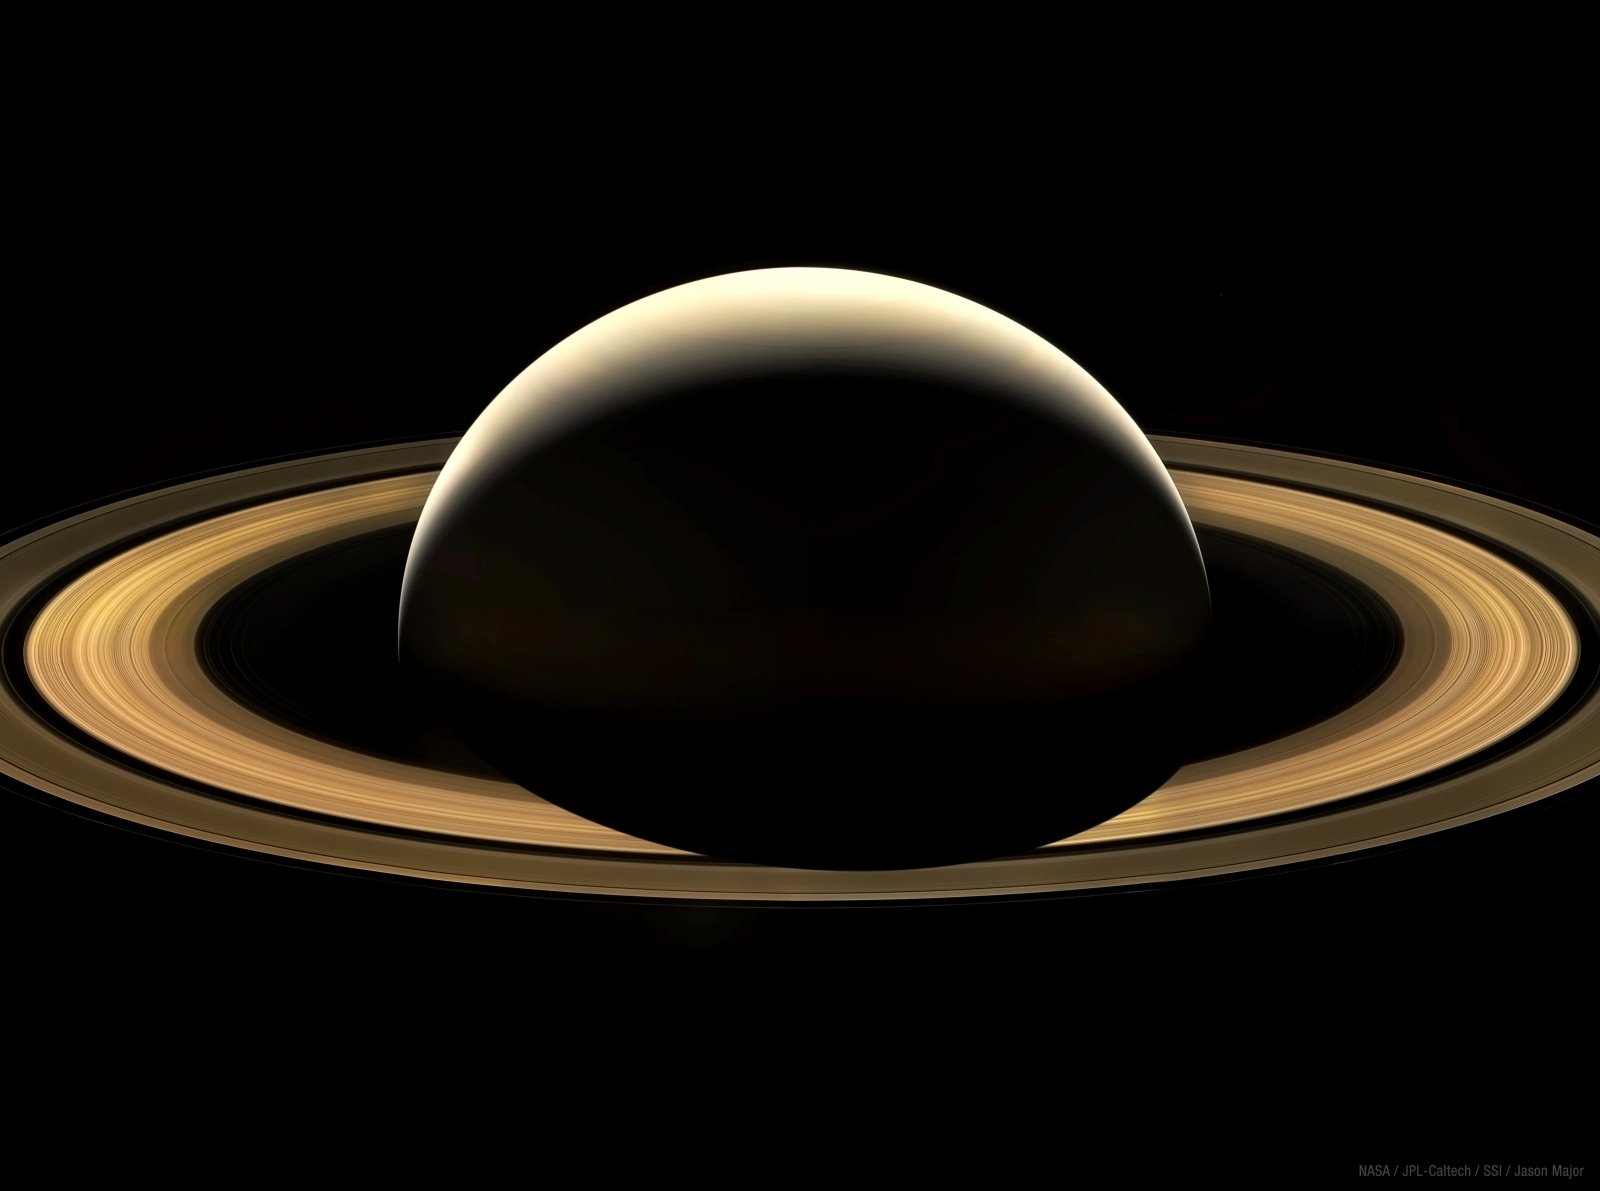 Cassini's Final Mosaic of Saturn